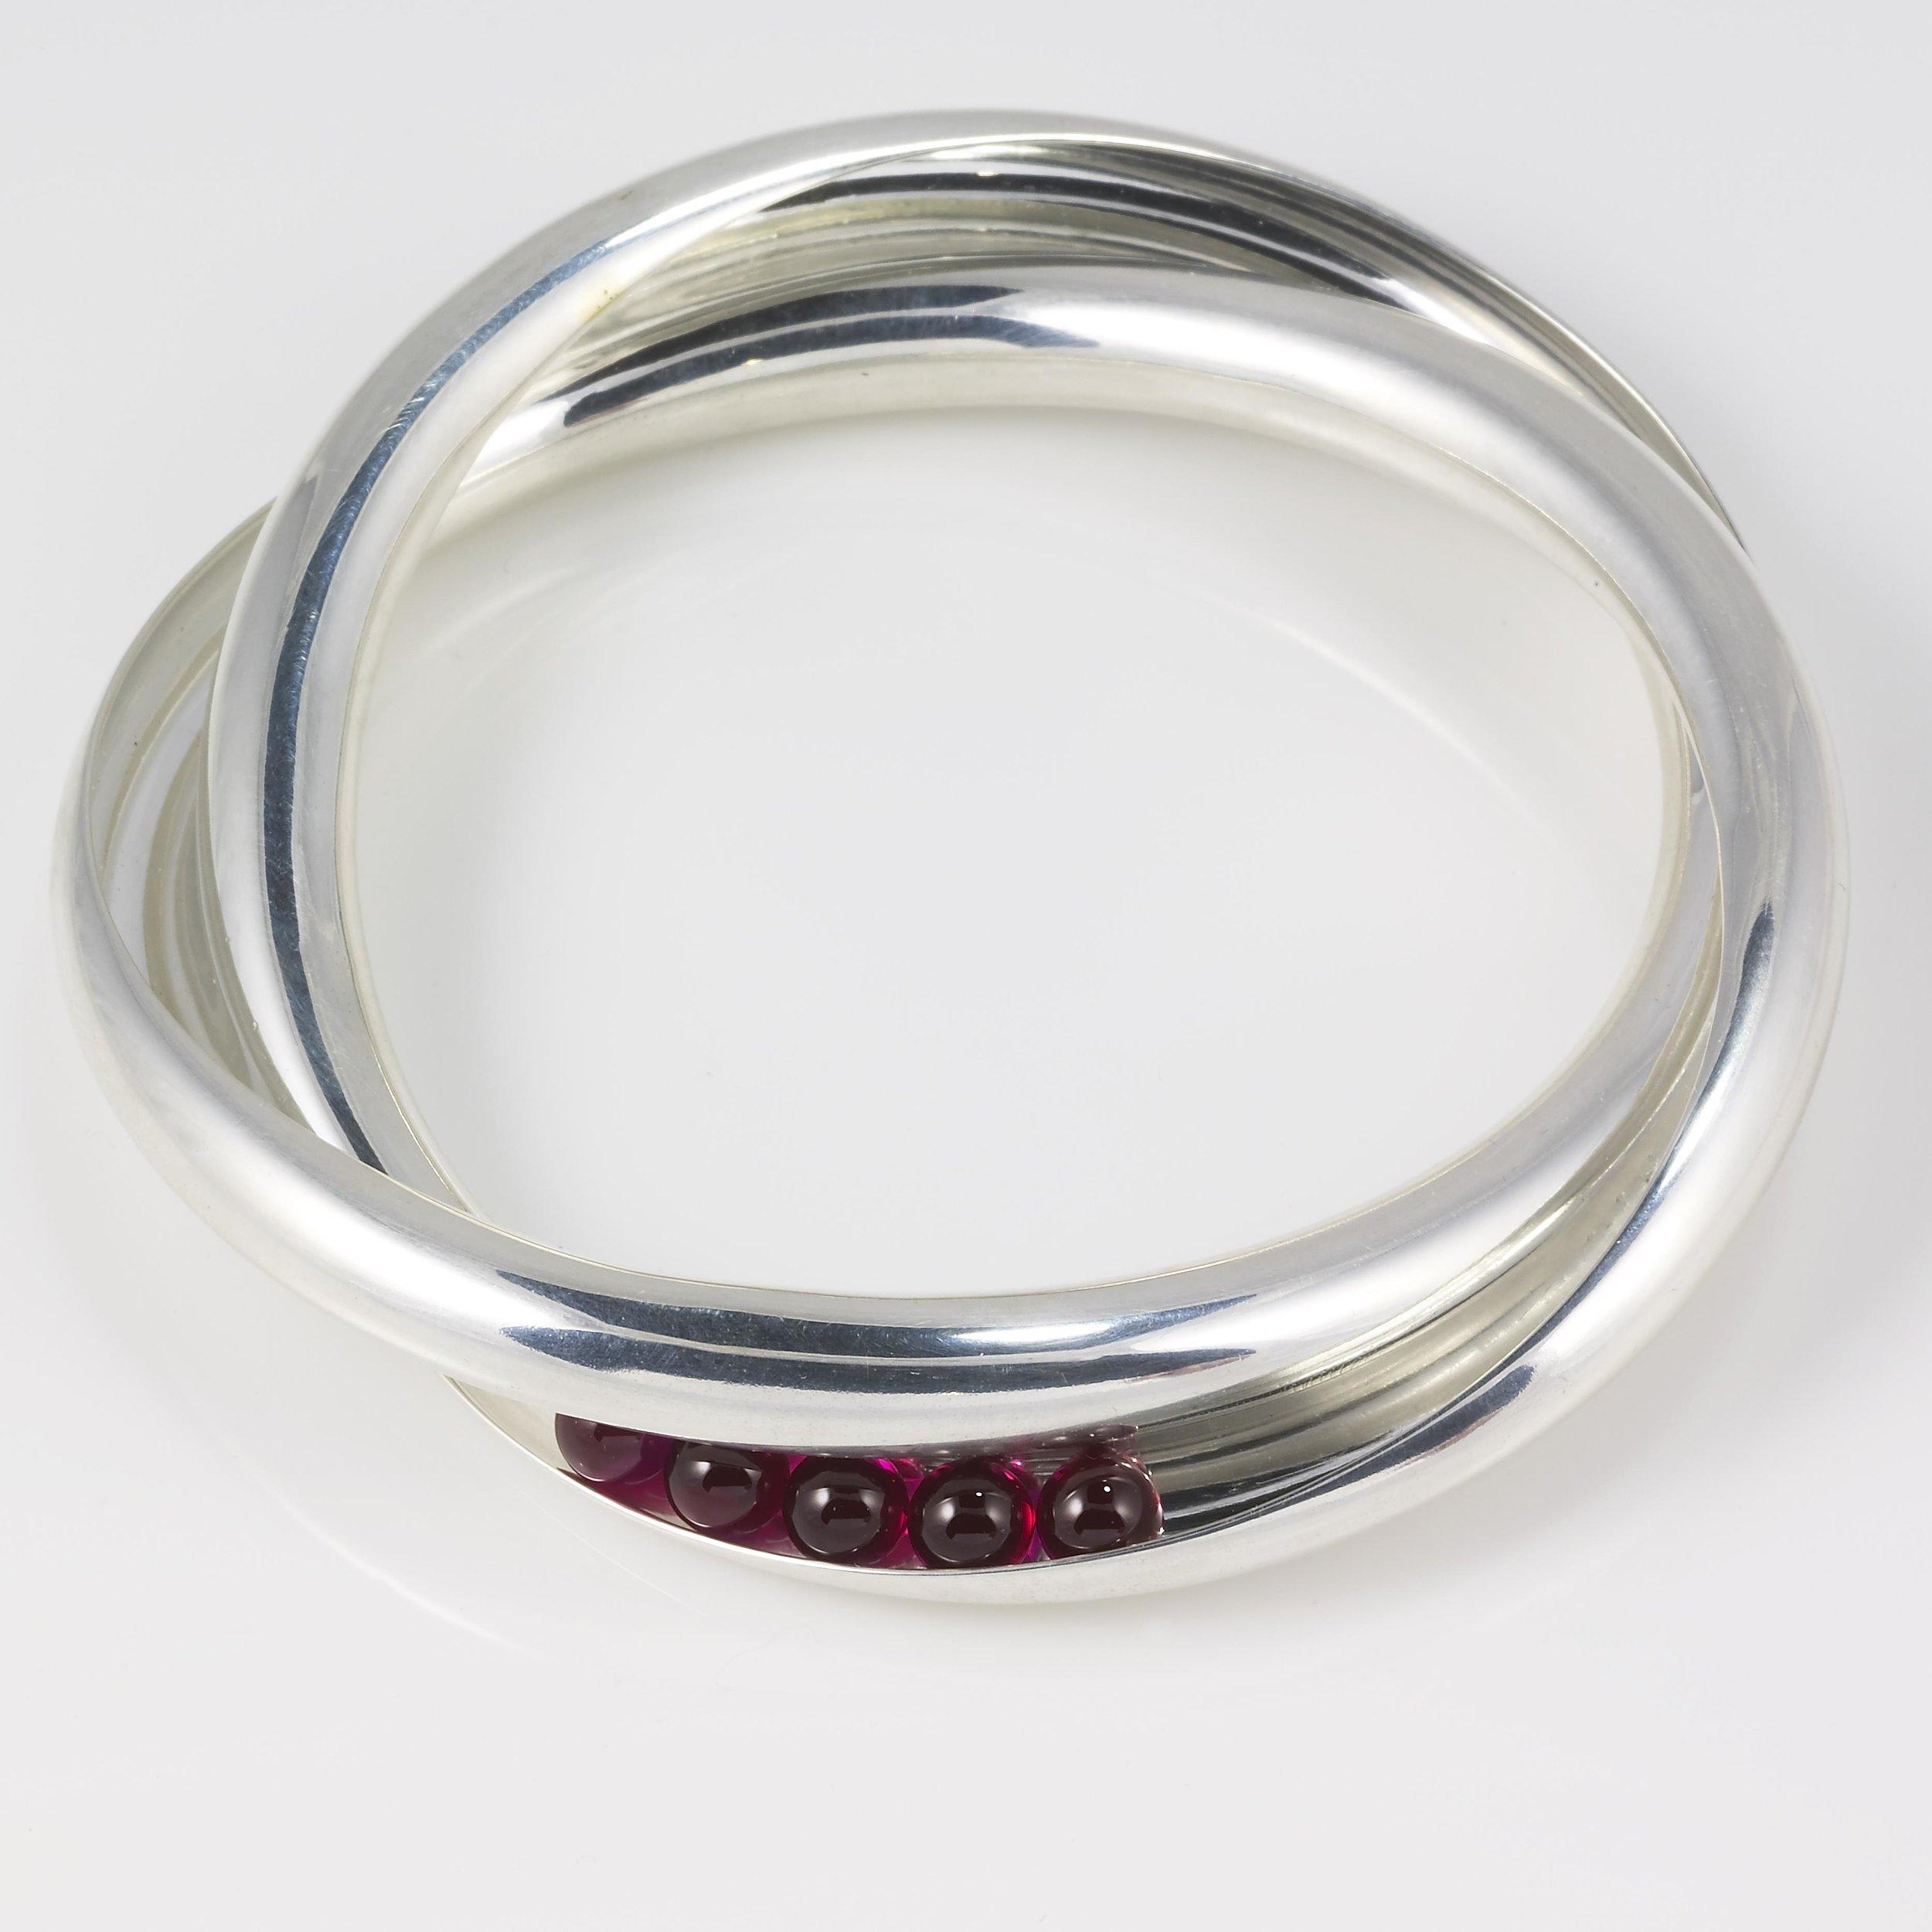 Silver/Argentium™ Silver